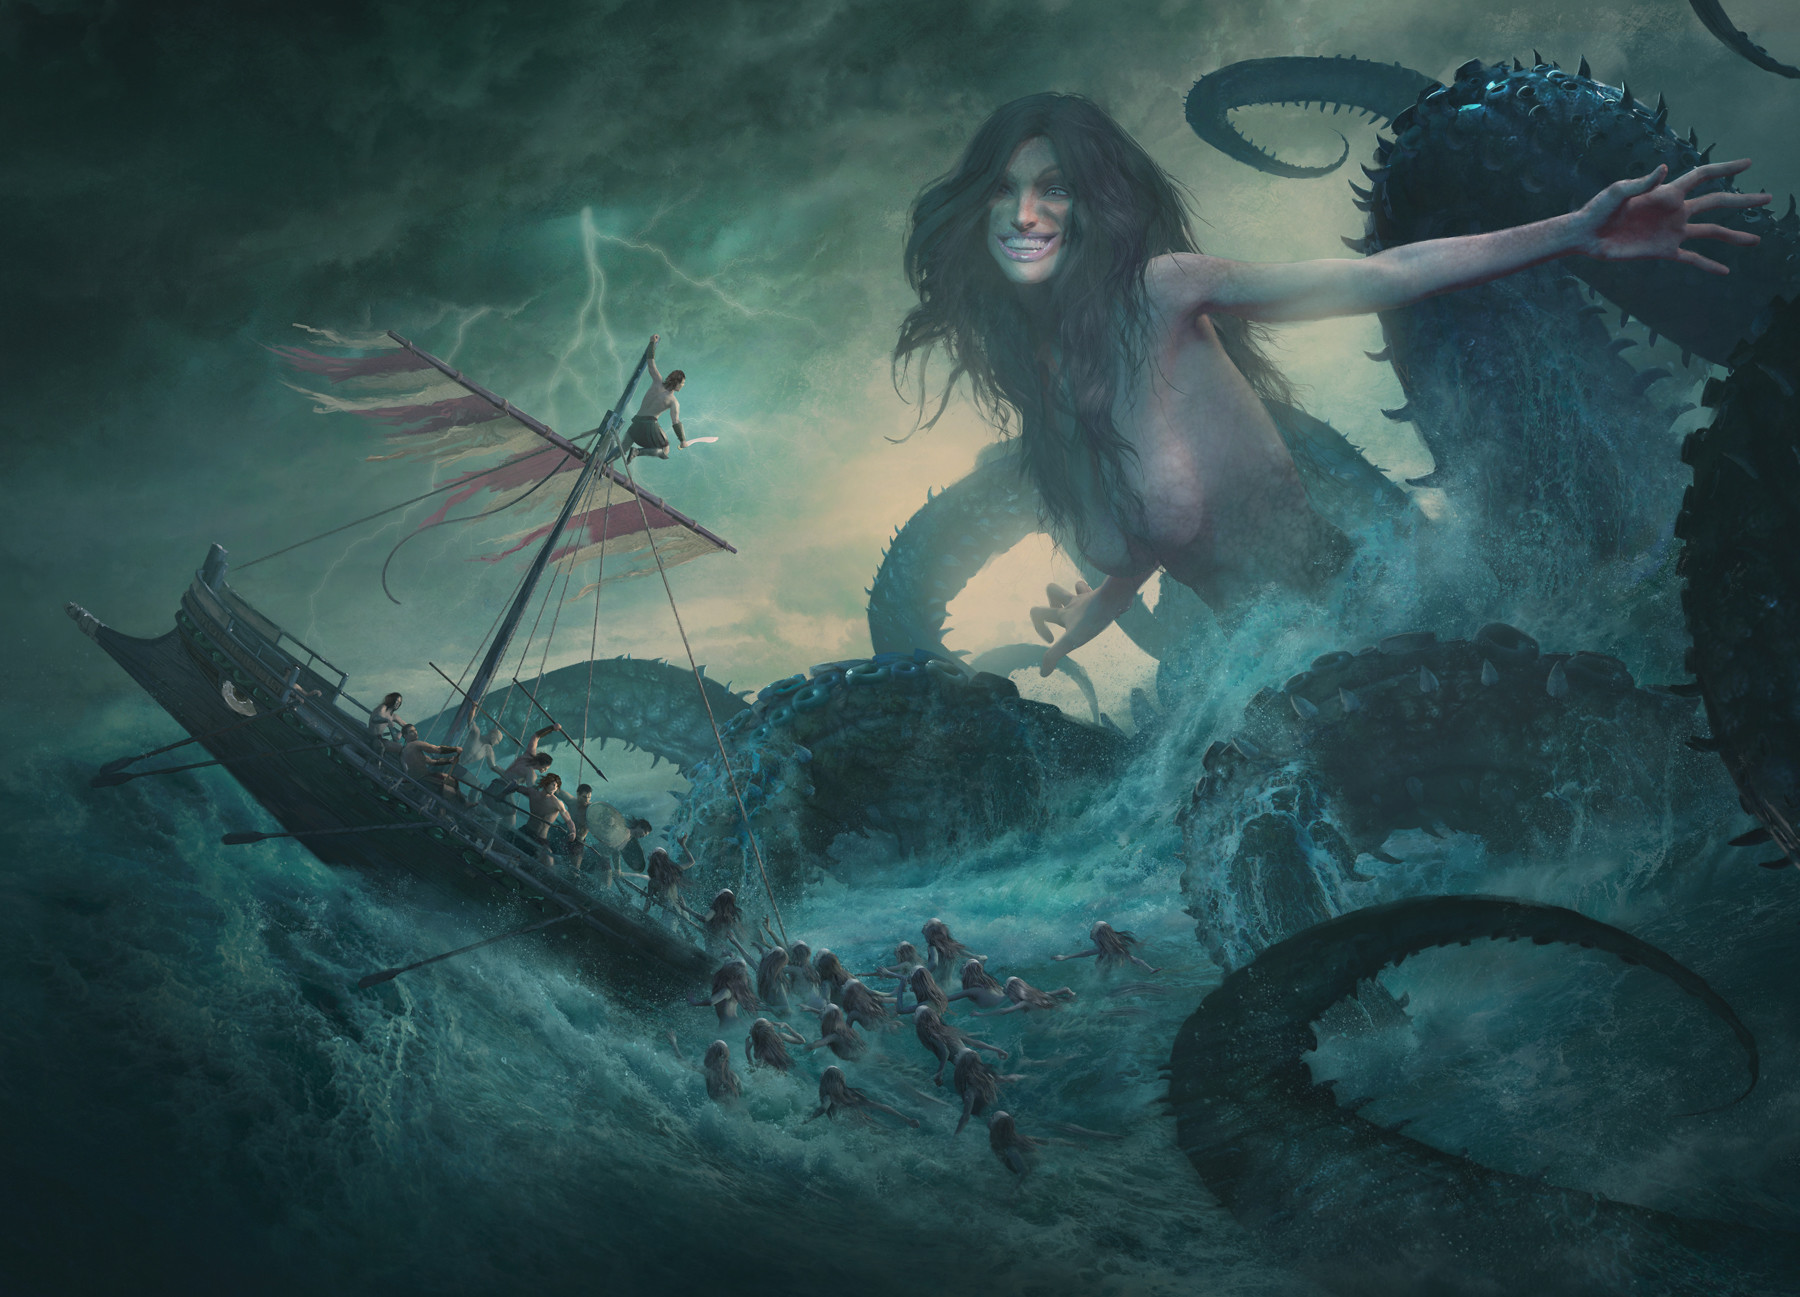 Guillem h pongiluppi board cover mythic battles poseidon